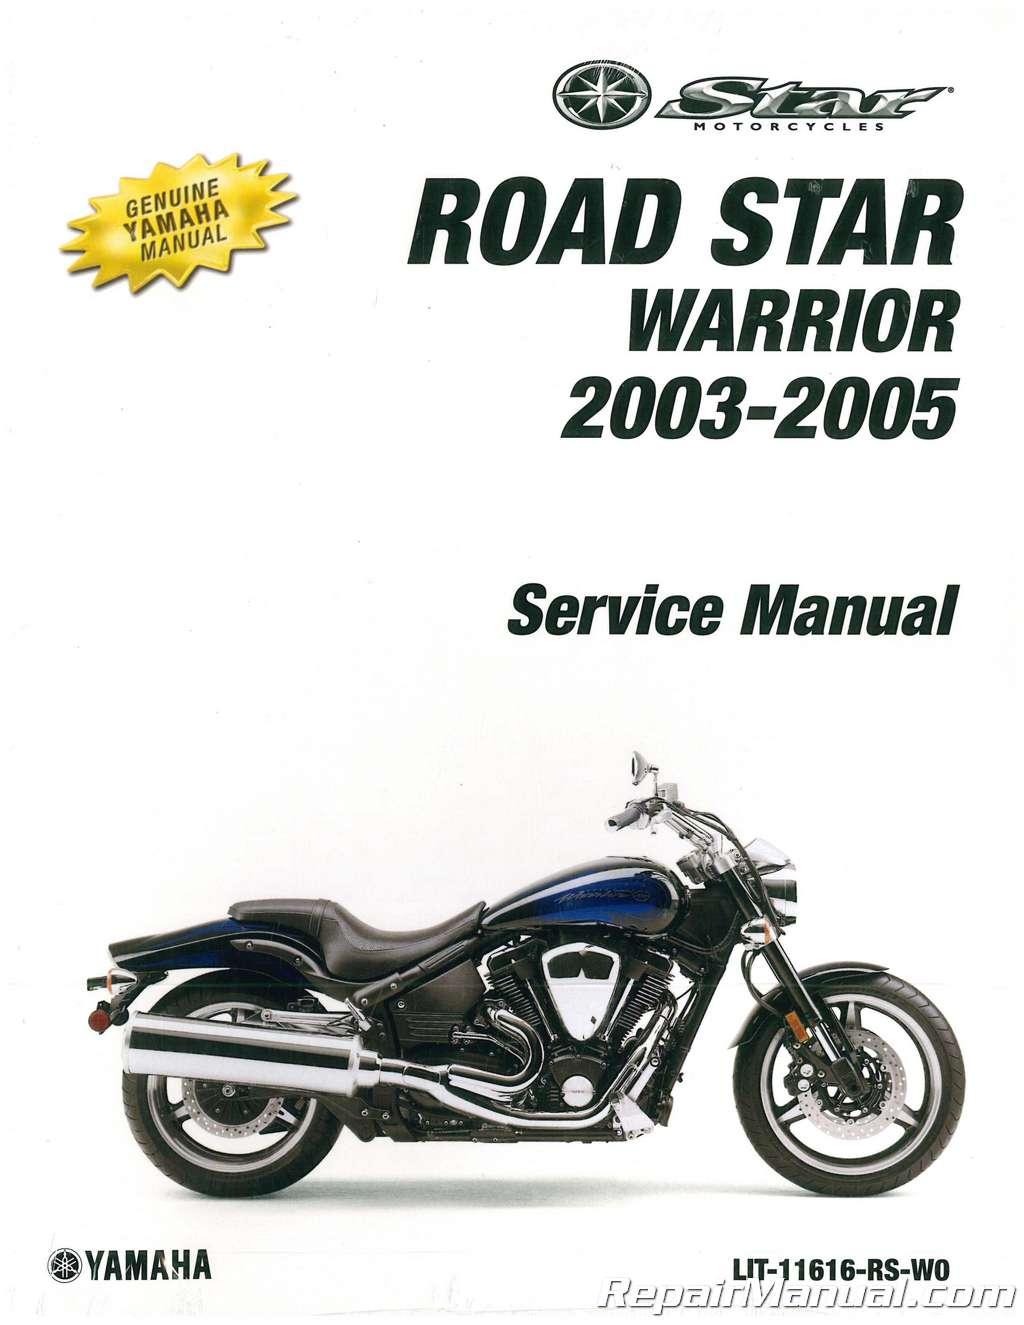 2003 2005 yamaha xv1700 road star warrior motorcycle service manual rh repairmanual com 2004 yamaha road star 1700 service manual yamaha road star xv1700 service manual